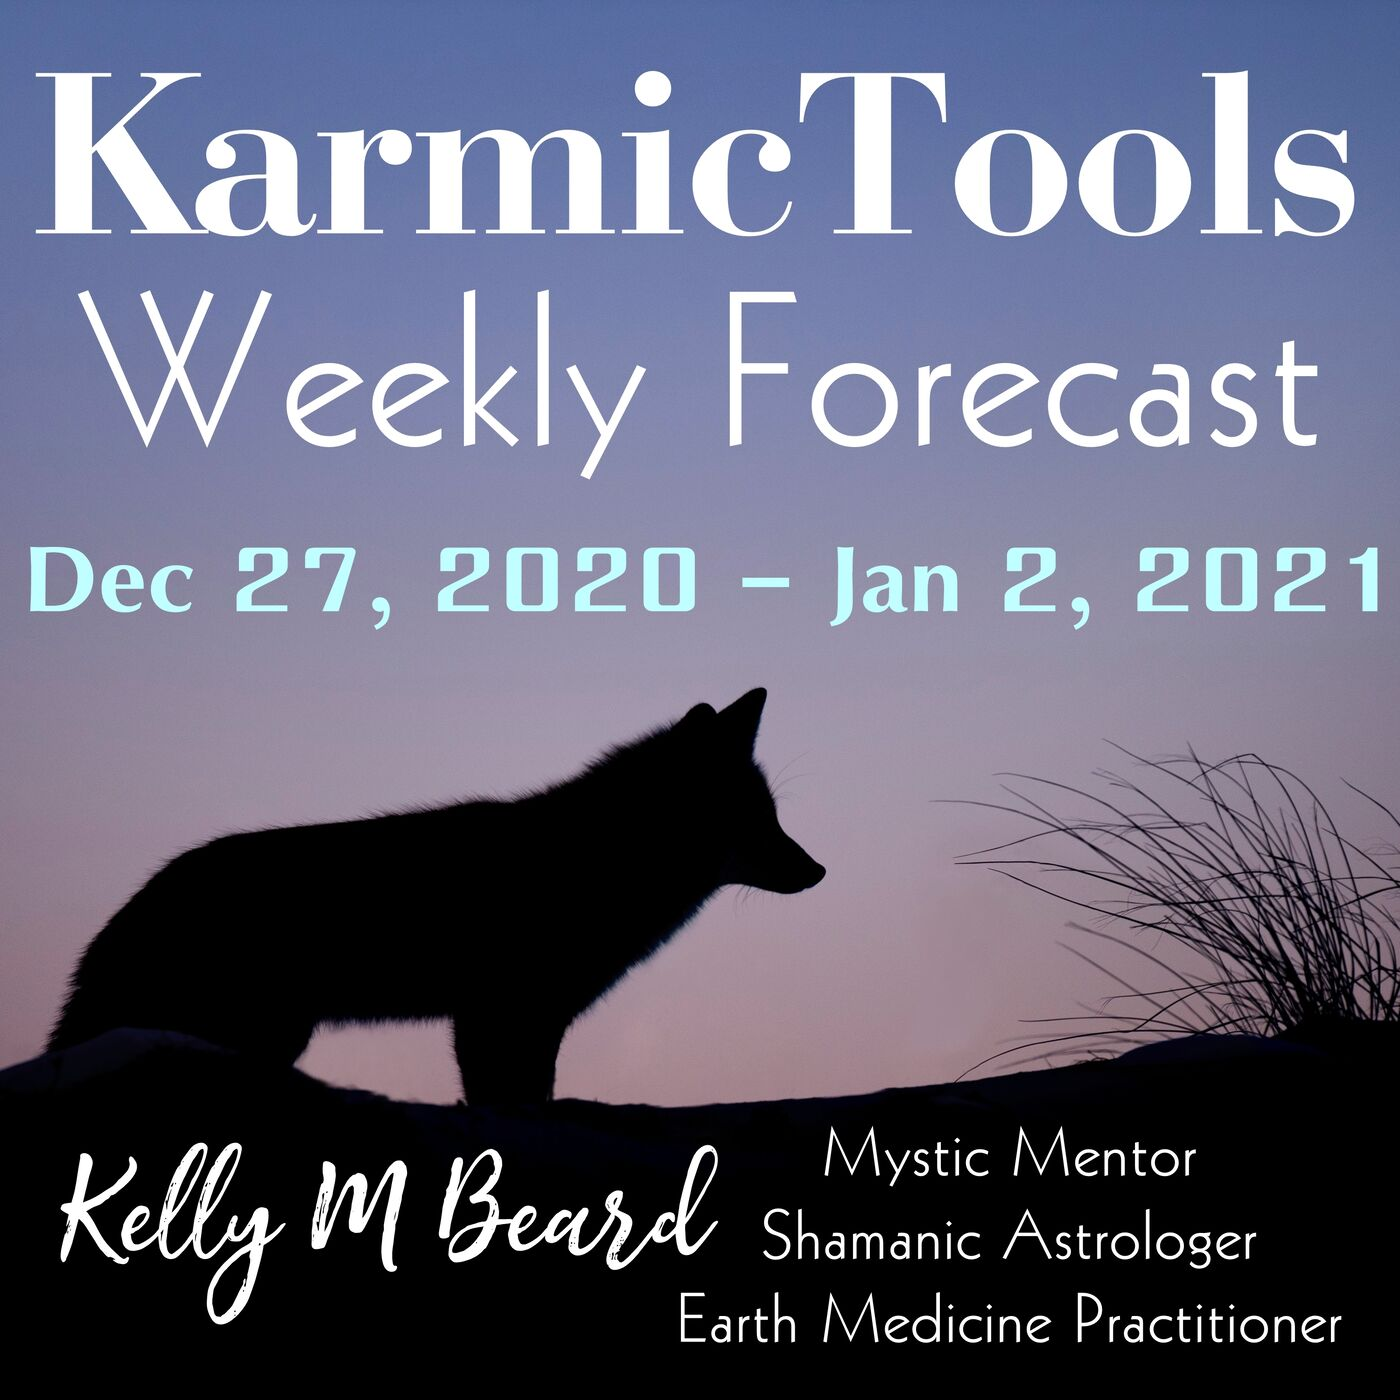 Dec 27 - Jan 2, 2021 KarmicTools Weekly Forecast